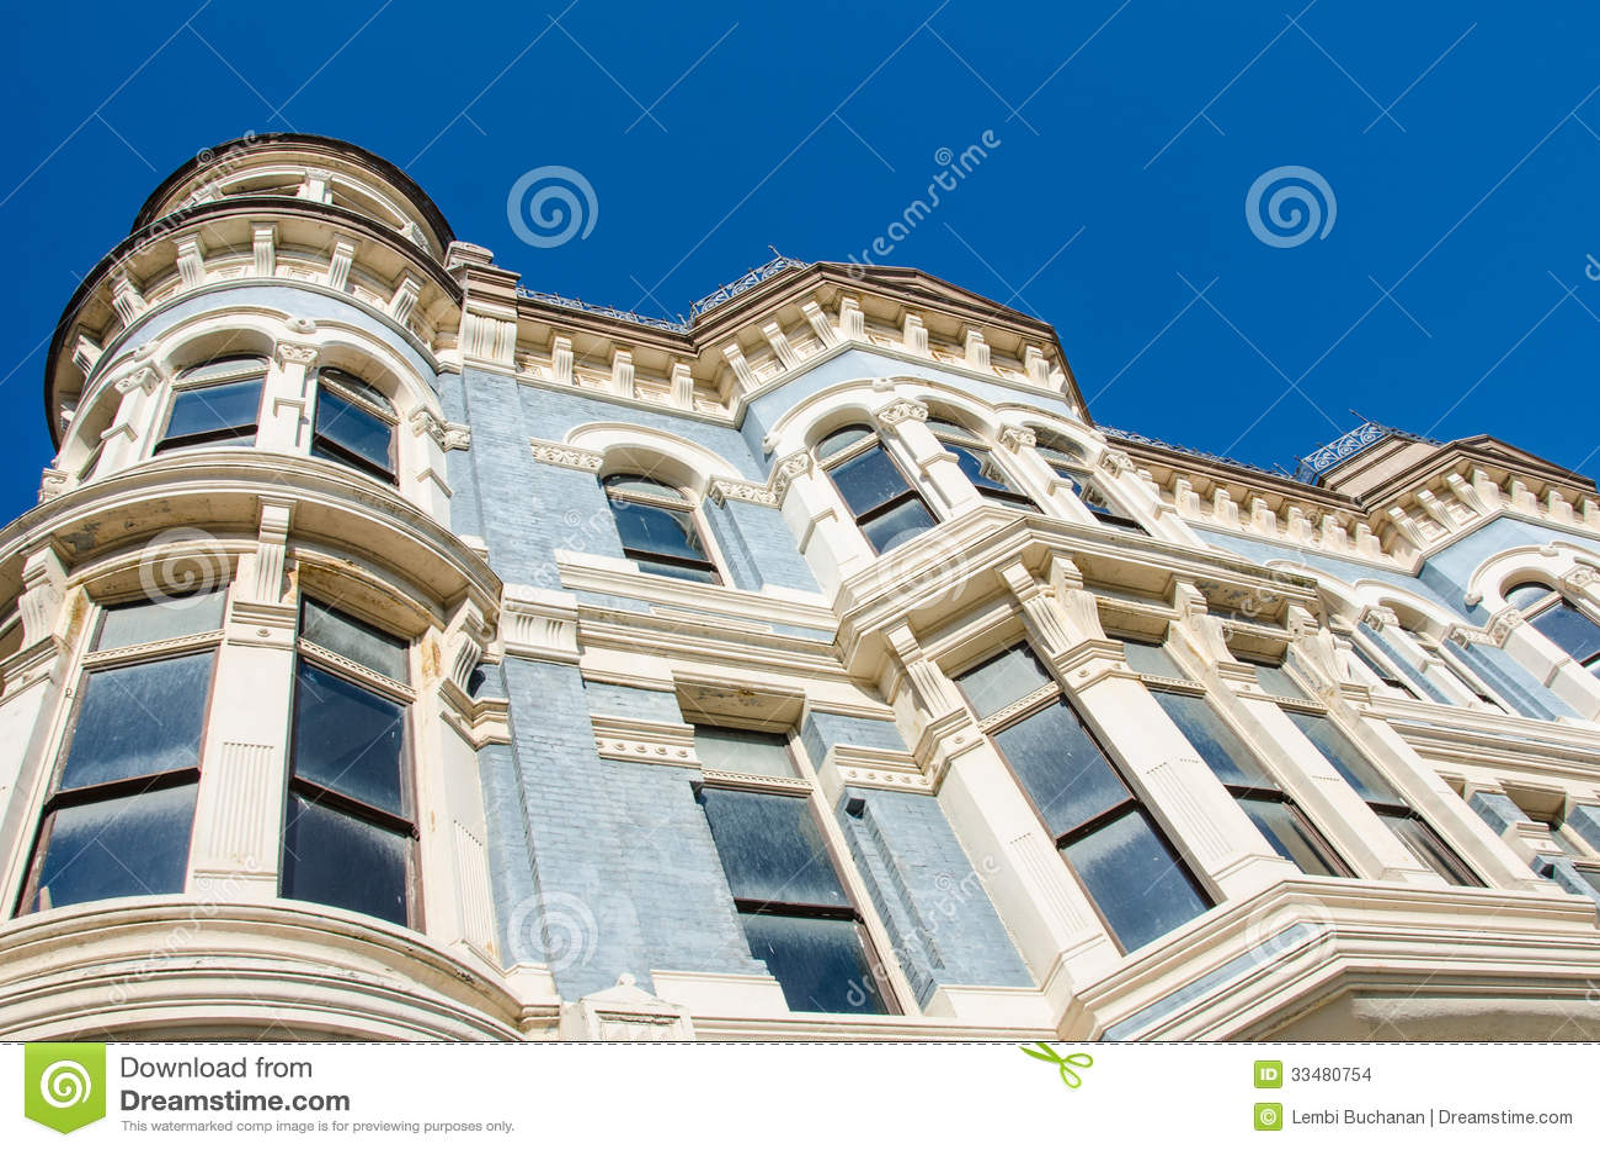 architettura vittoriana in porto townsend washington